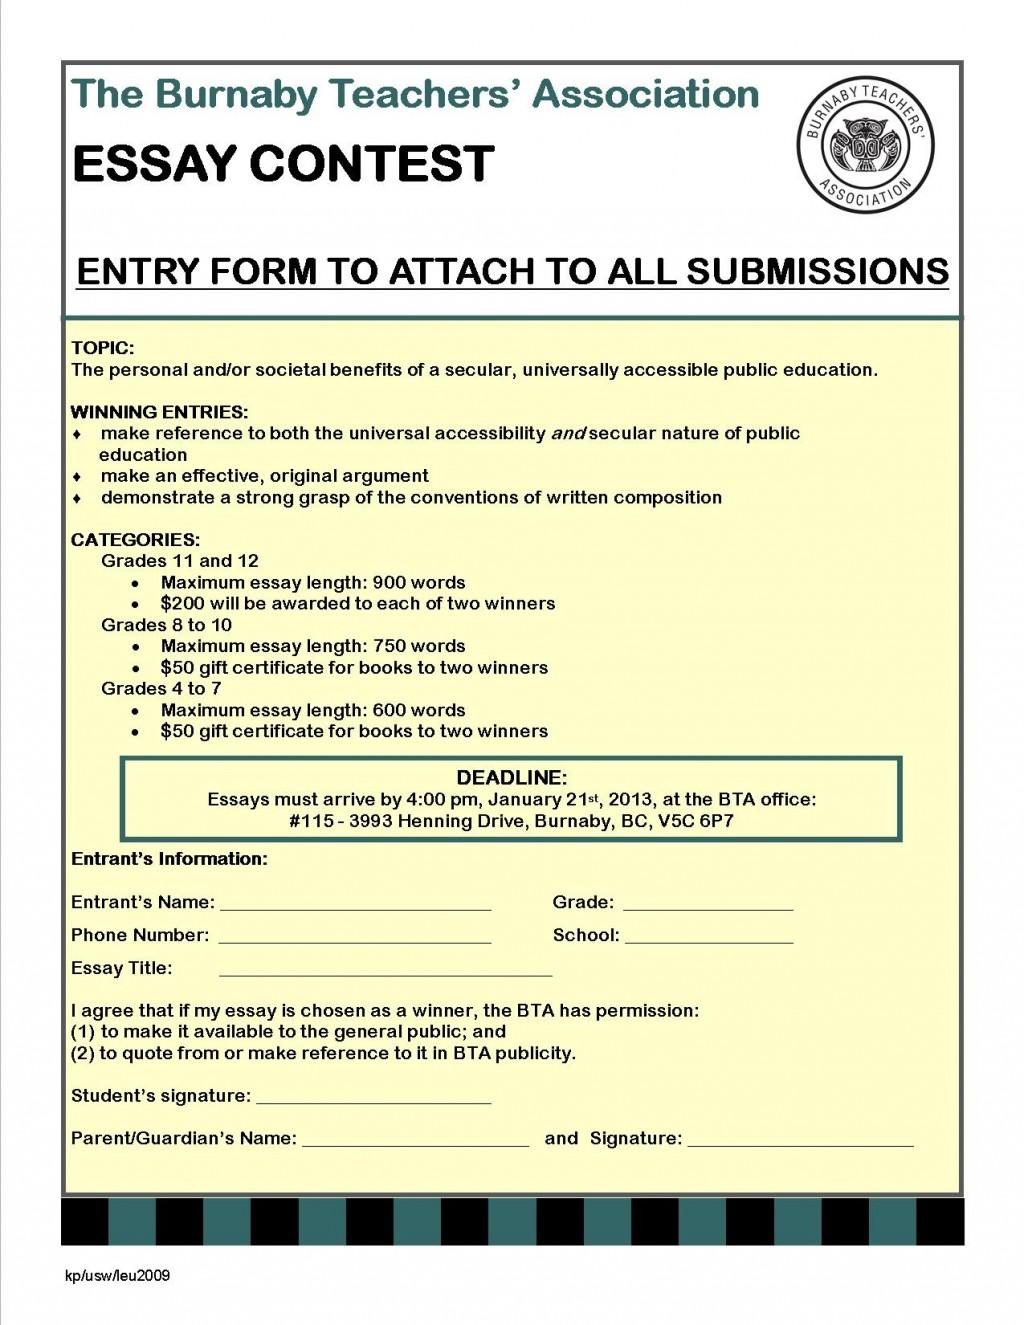 012 Respect Essay To Copy Bta Contest Entry Form Surprising Large